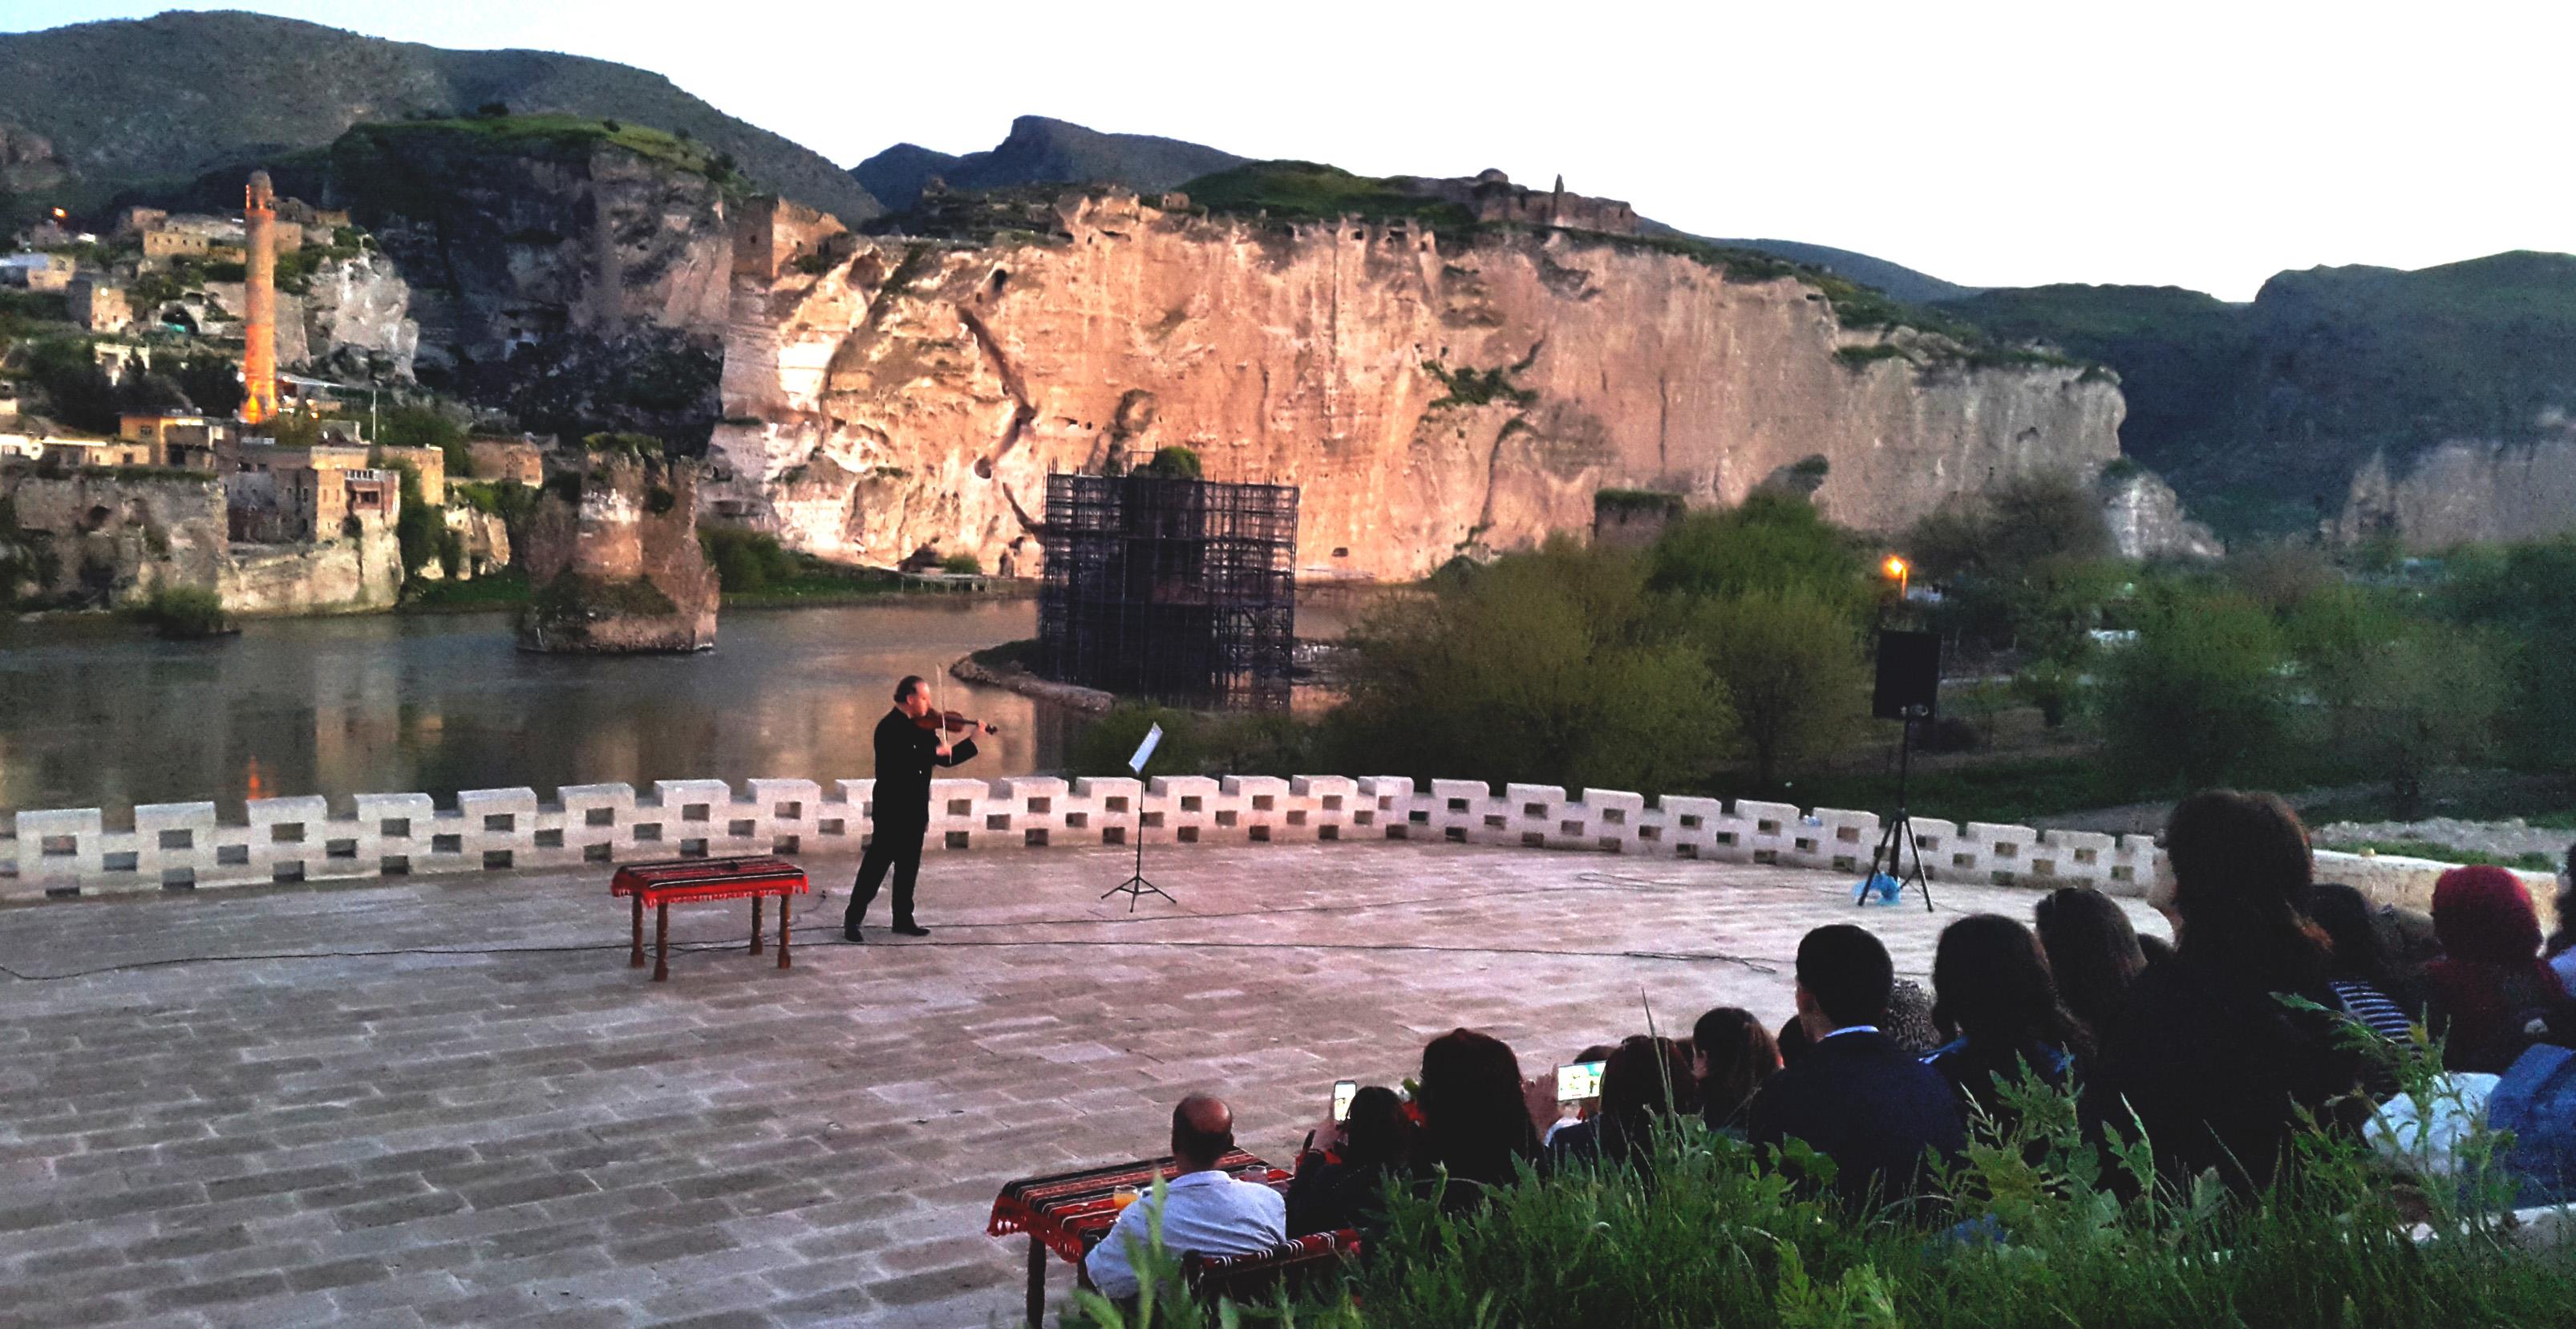 2015.04.17 Violin Residence!, Hasankeyf